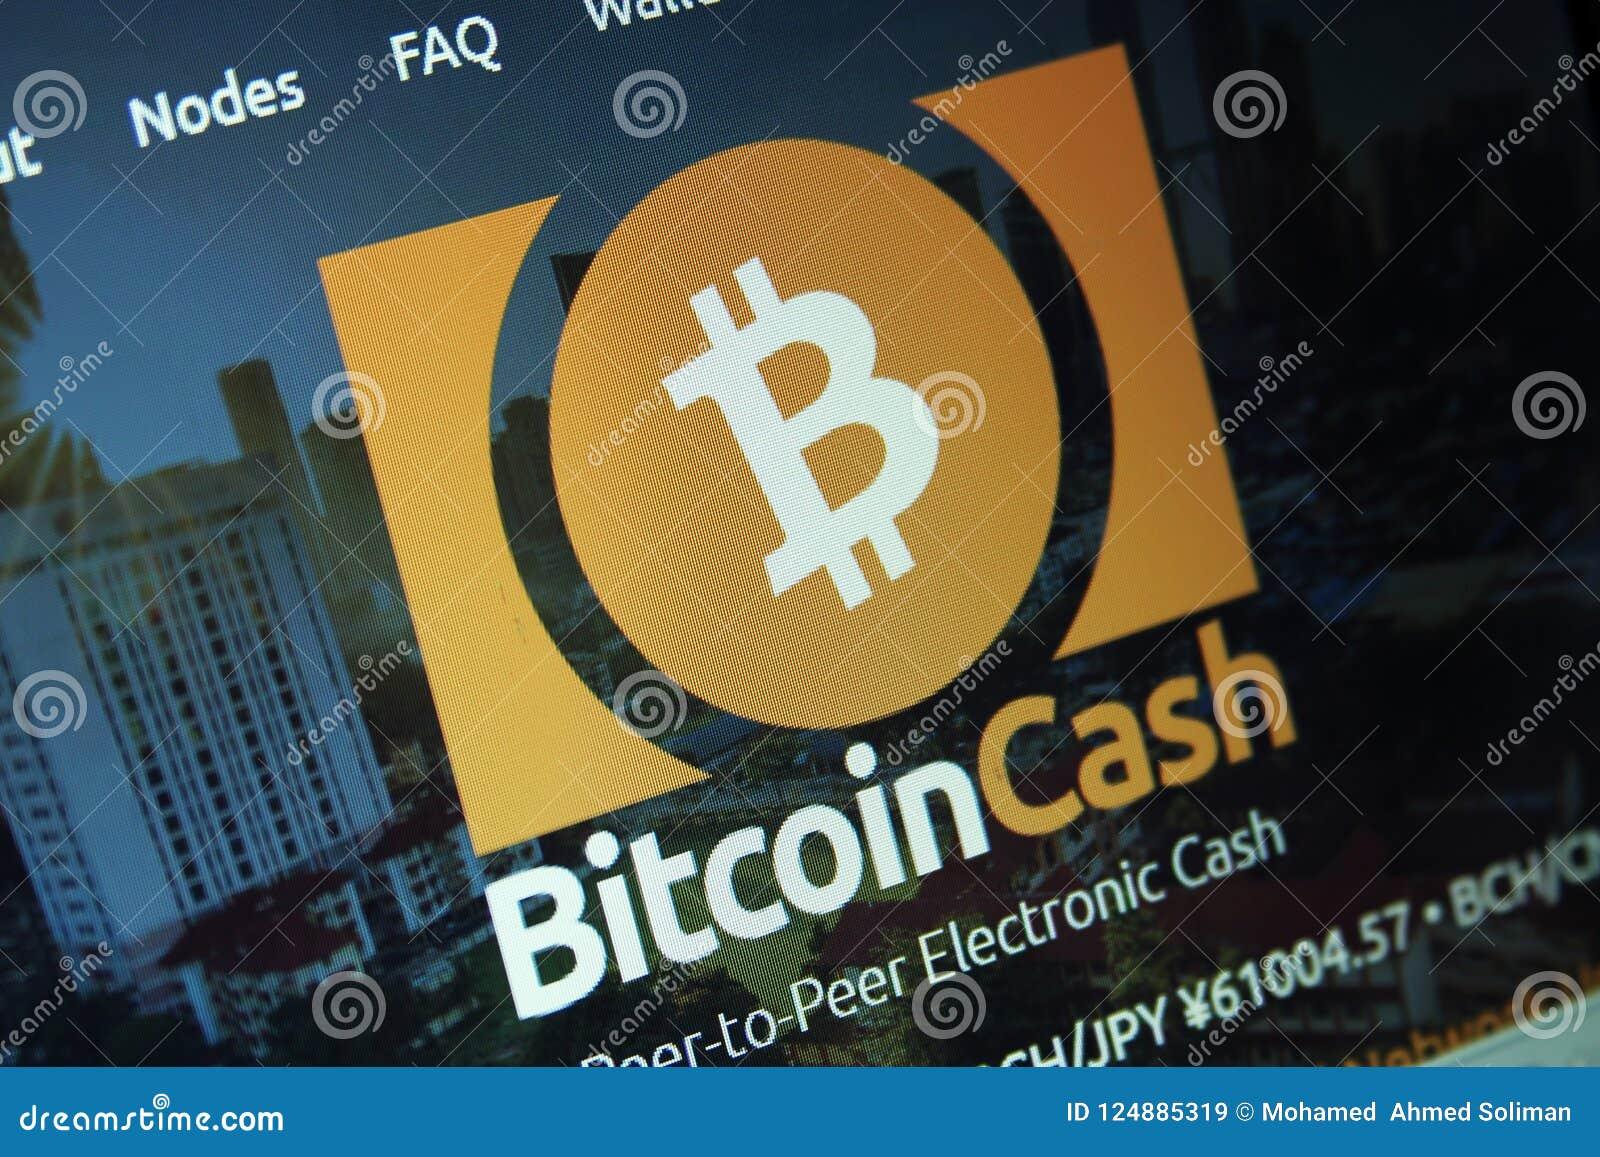 bitcoin original website